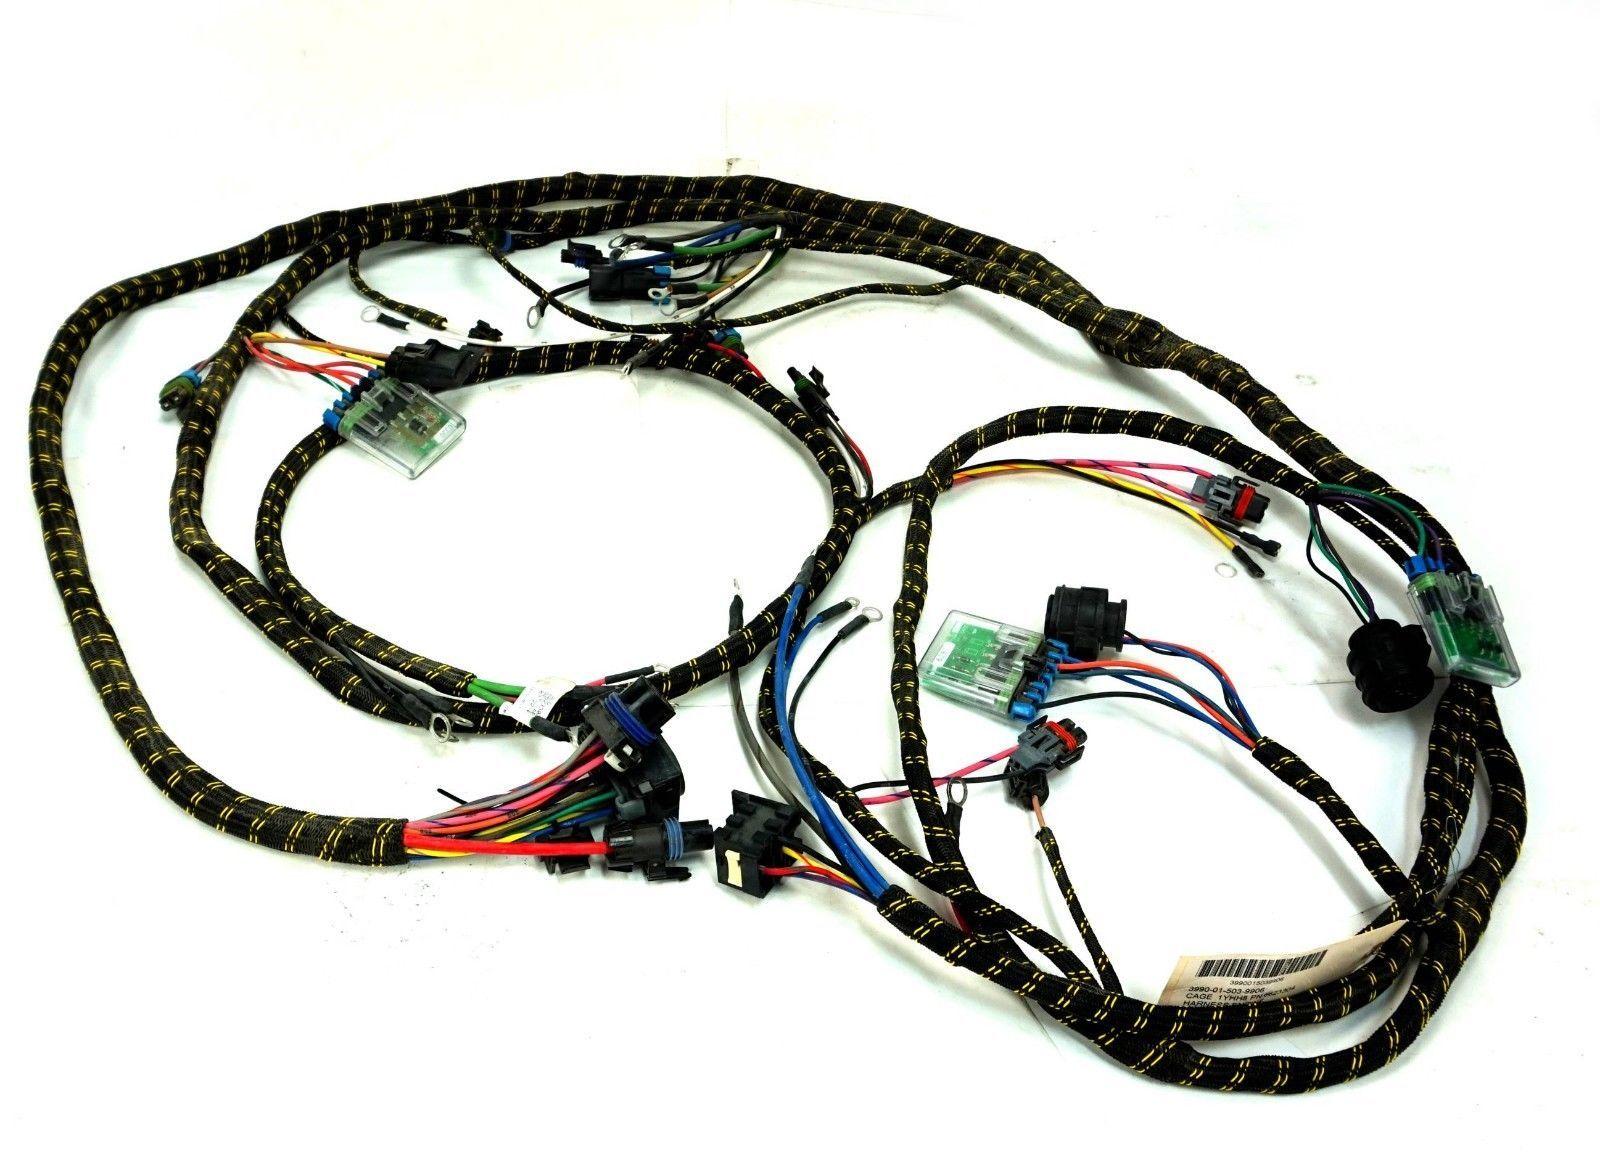 Enjoyable Jlg Wiring Harness Wiring Diagram Wiring Cloud Hisonuggs Outletorg